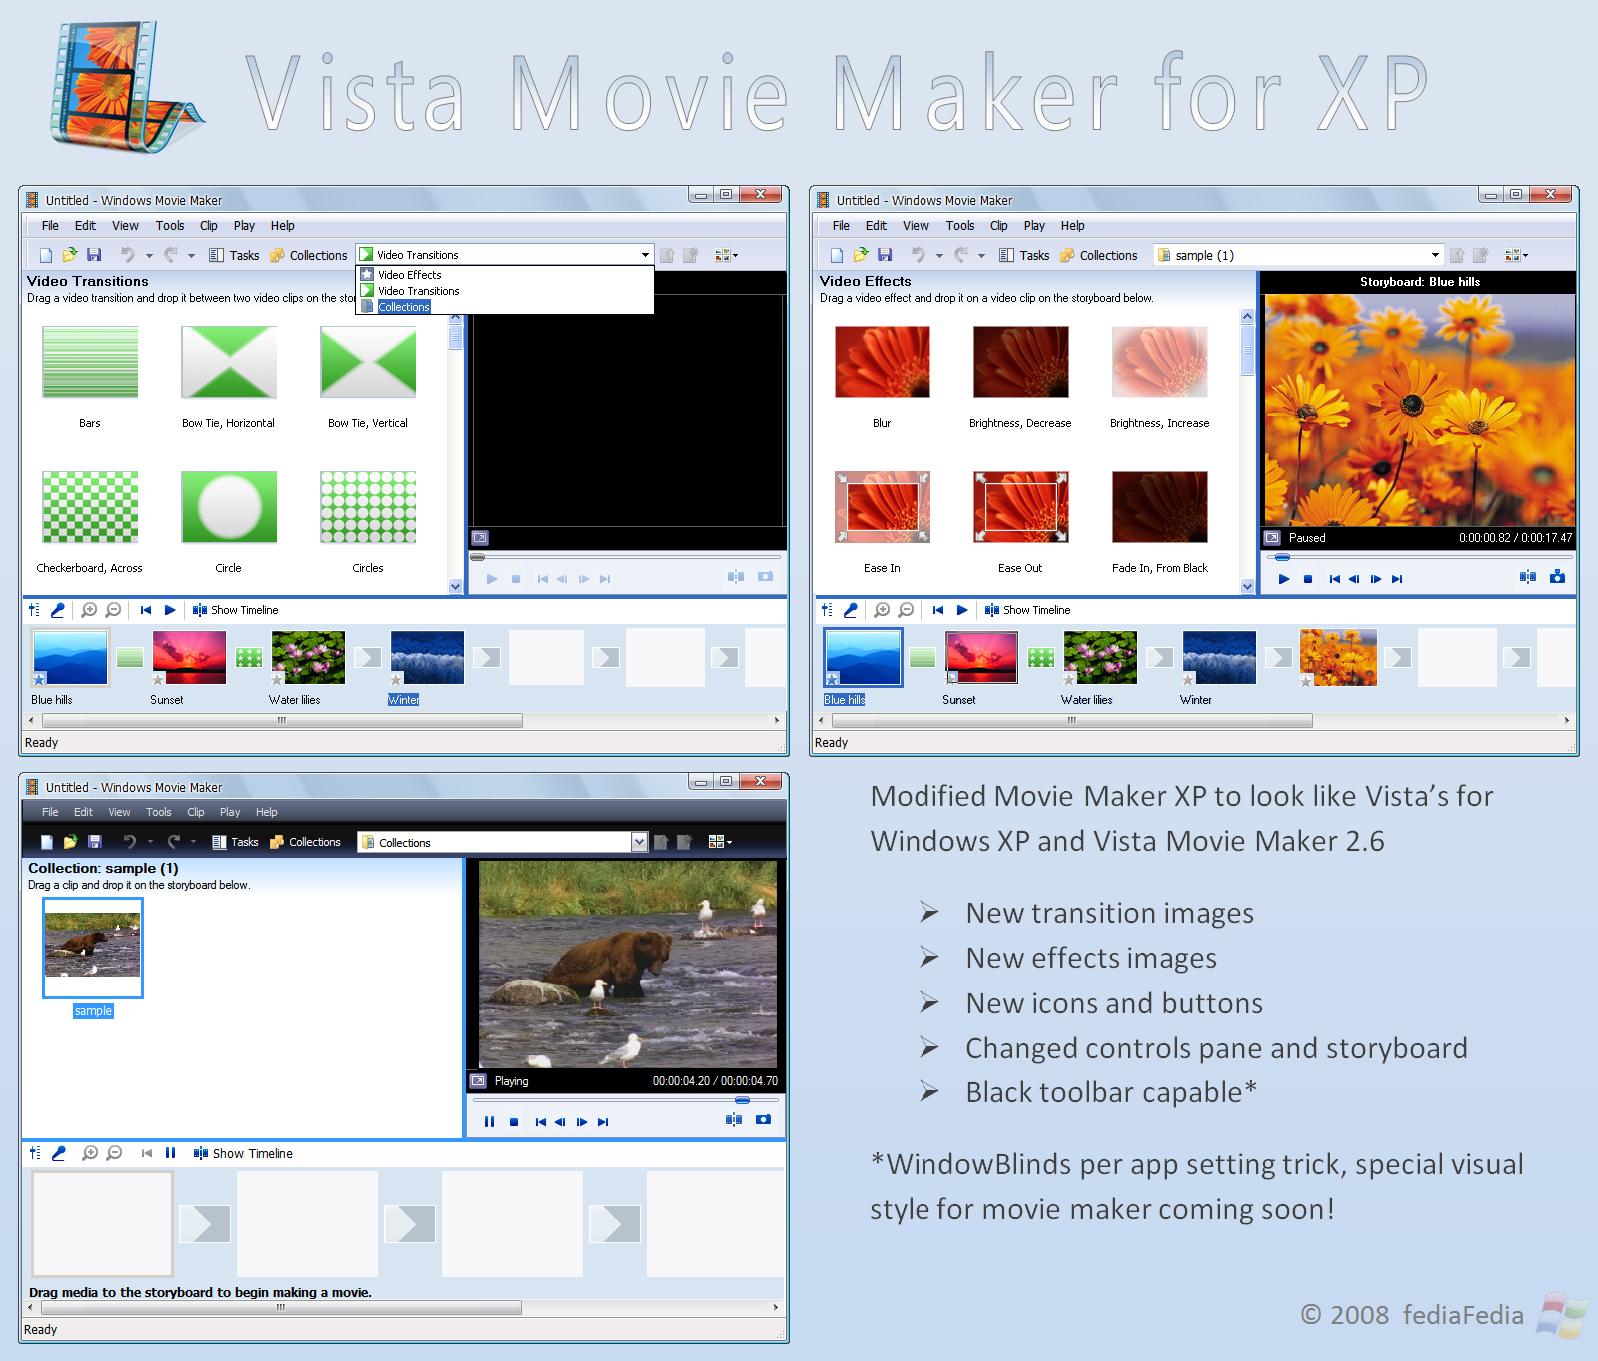 Vista's movieMaker for XP by fediaFedia